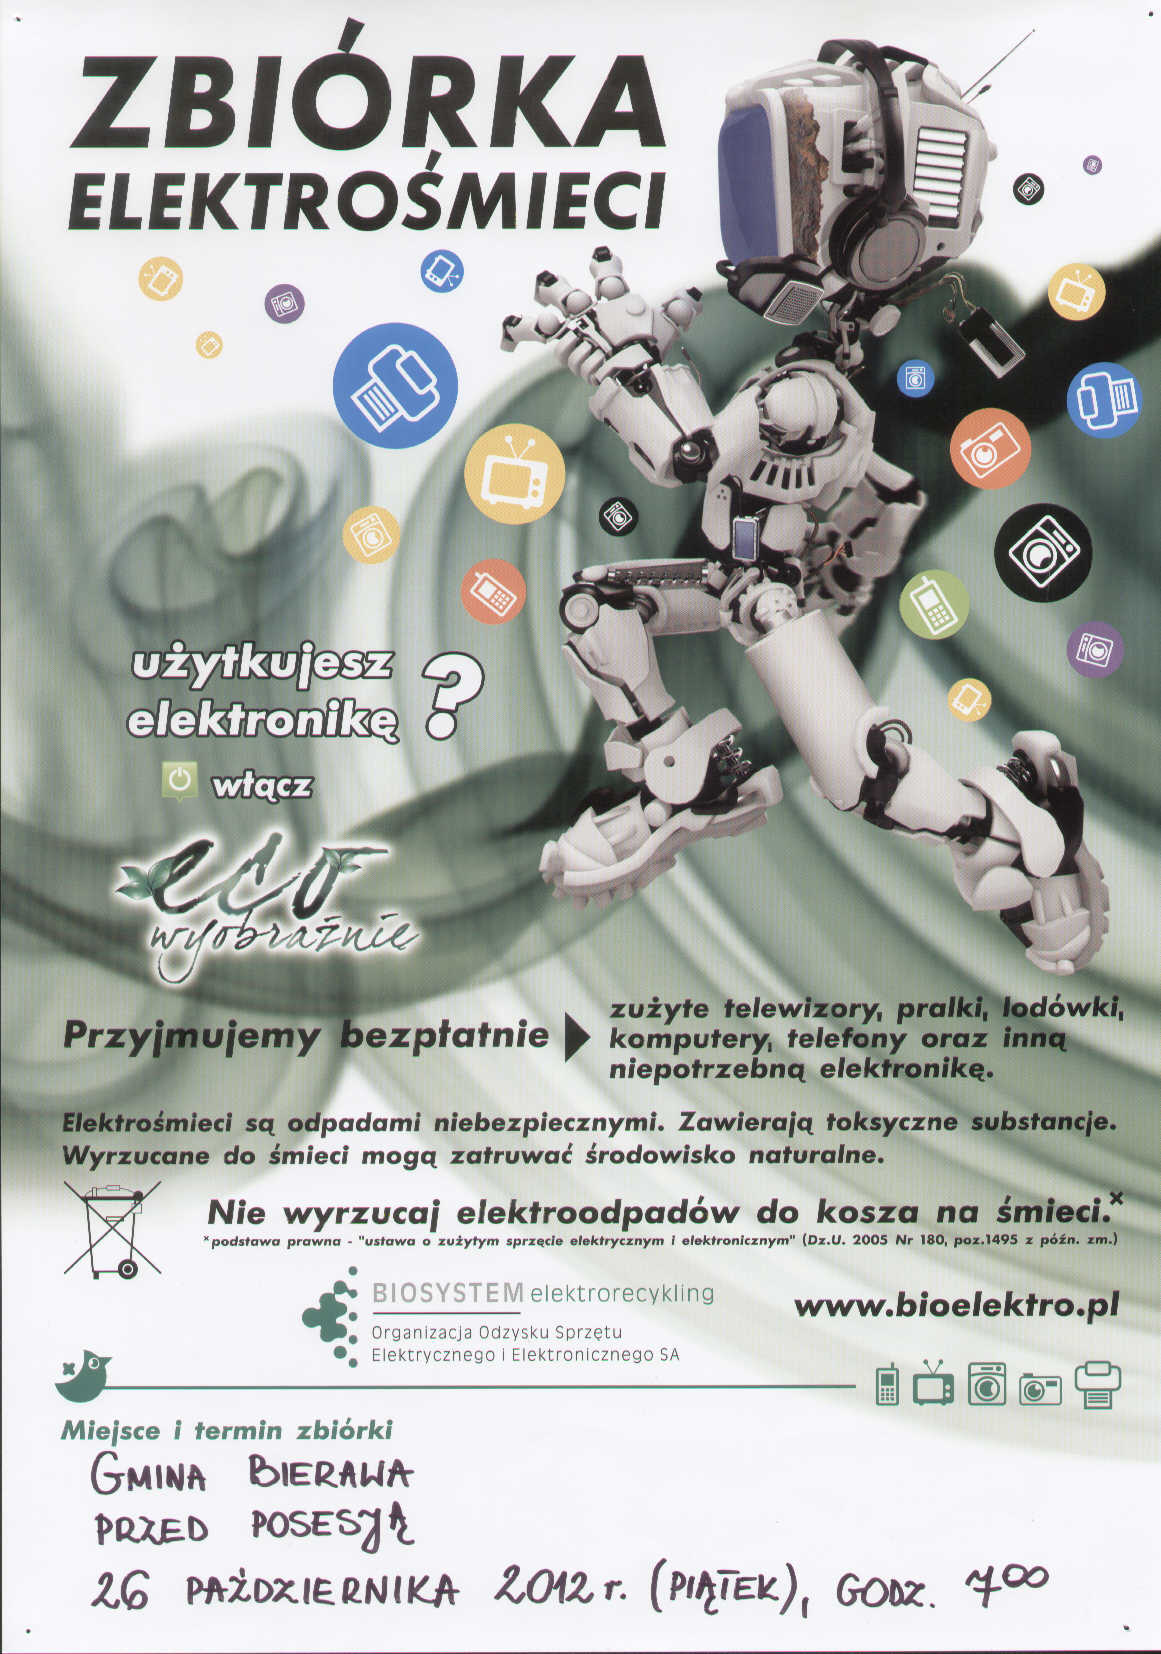 SWScan0014900091.jpeg